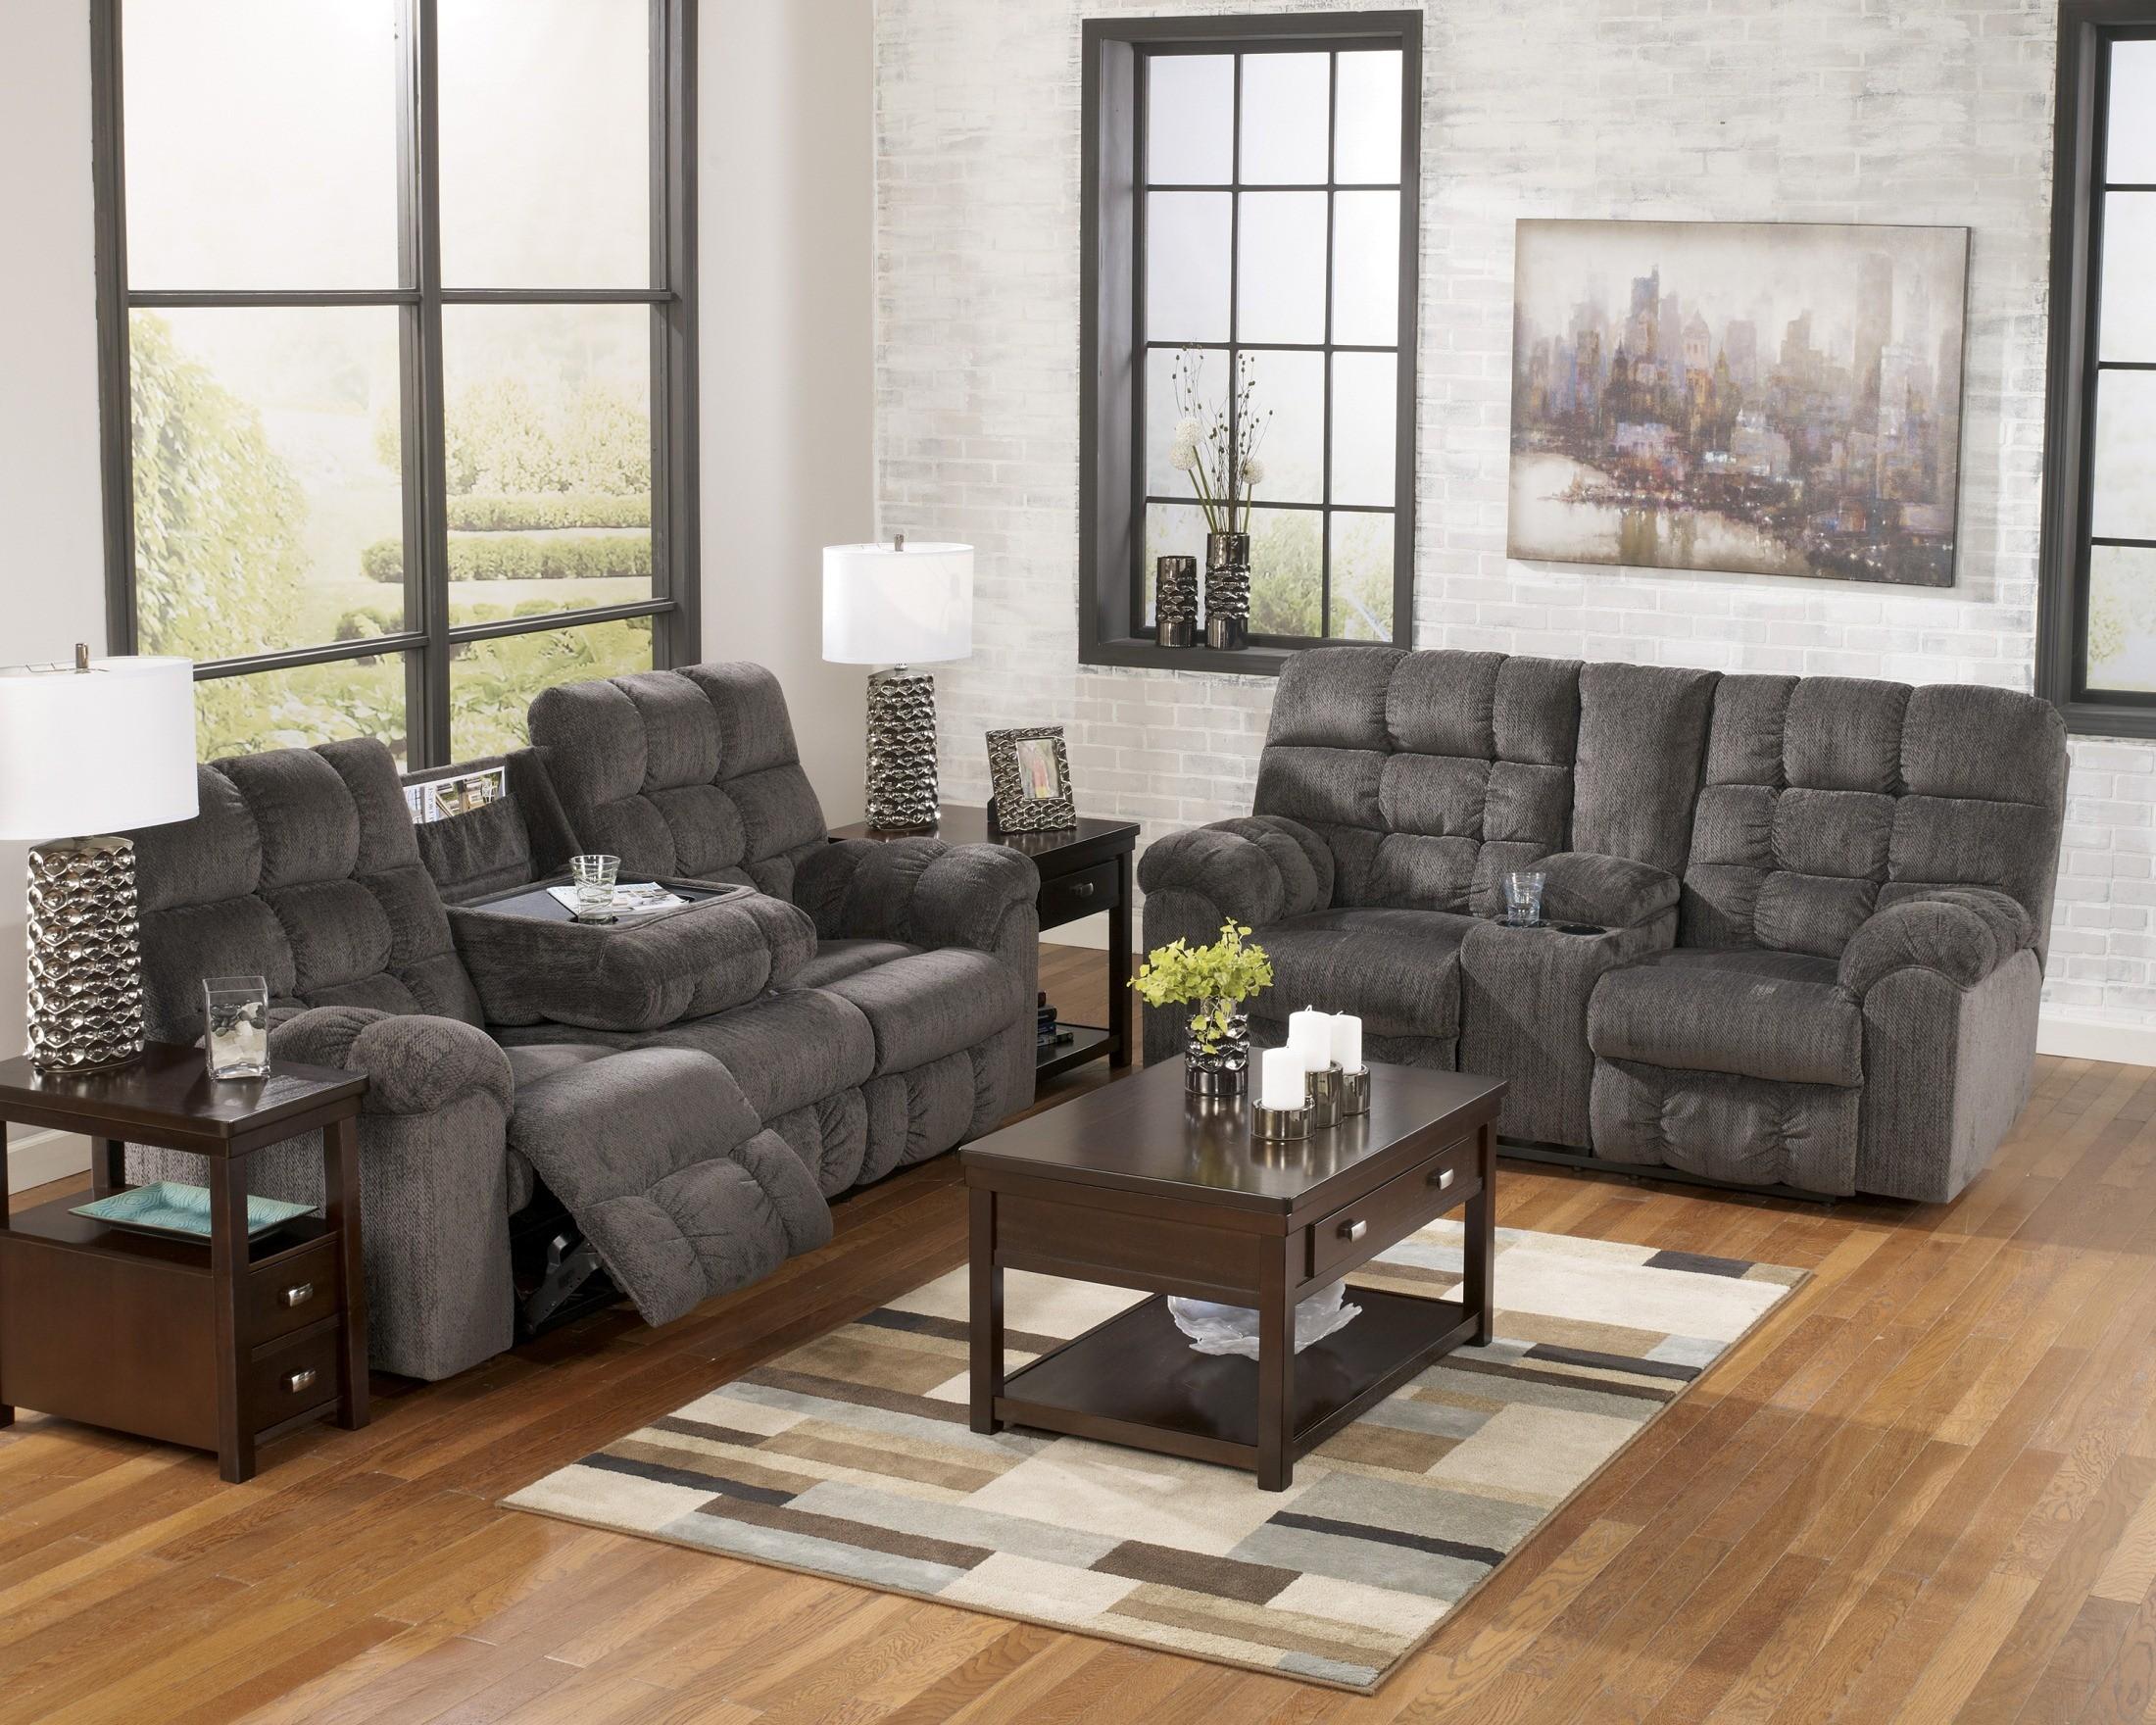 Living Room Set Deals Acieona Slate Living Room Set From Ashley 58300 Coleman Furniture